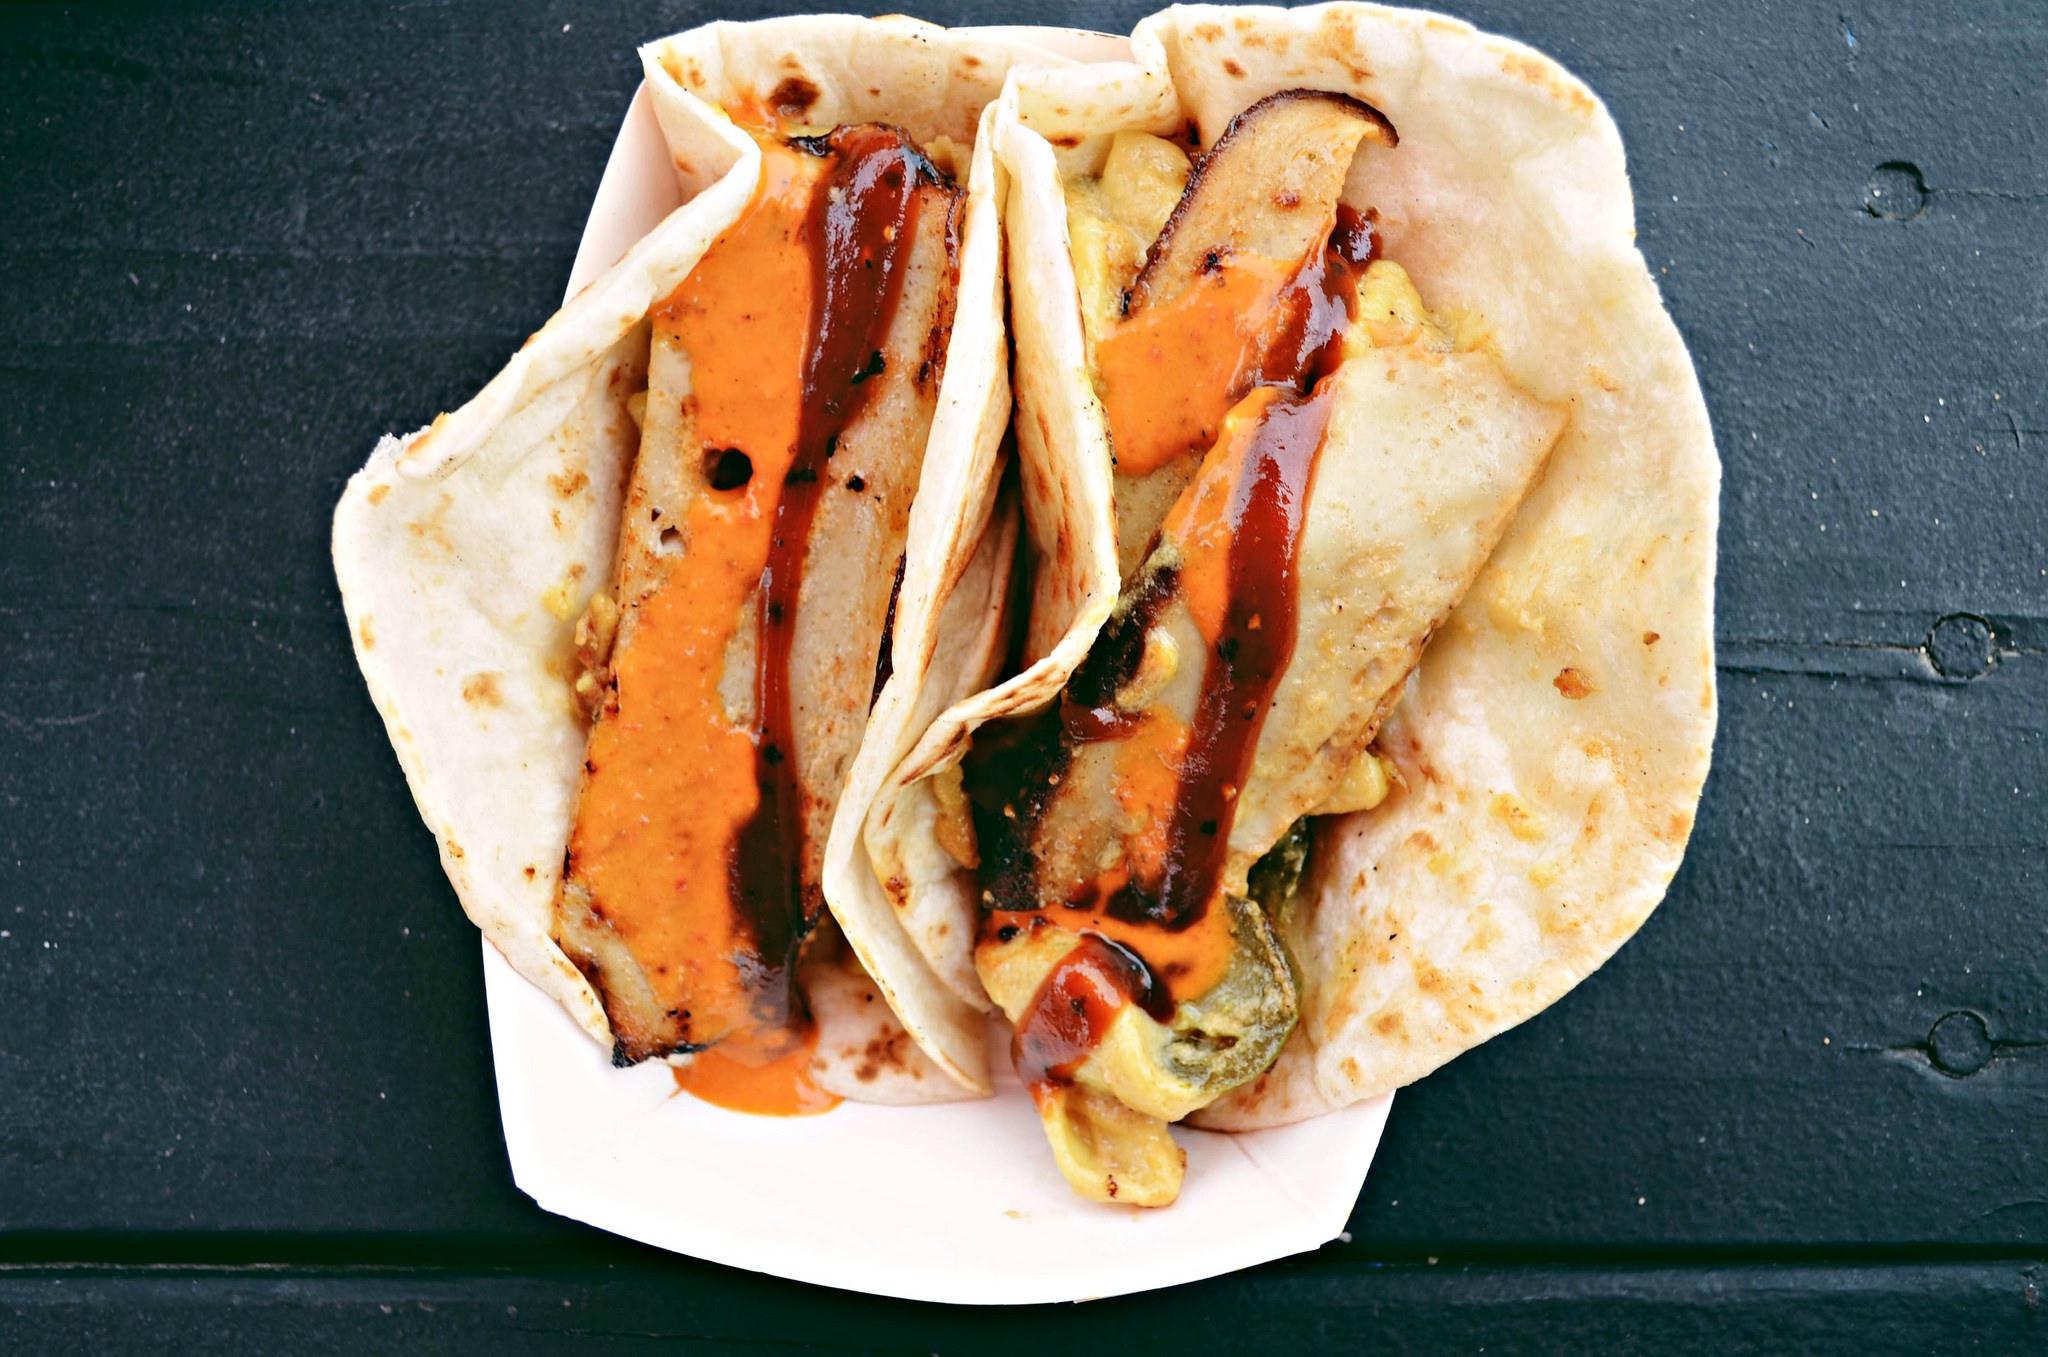 taco torchy's delicious secret menu tacos food austin democrat